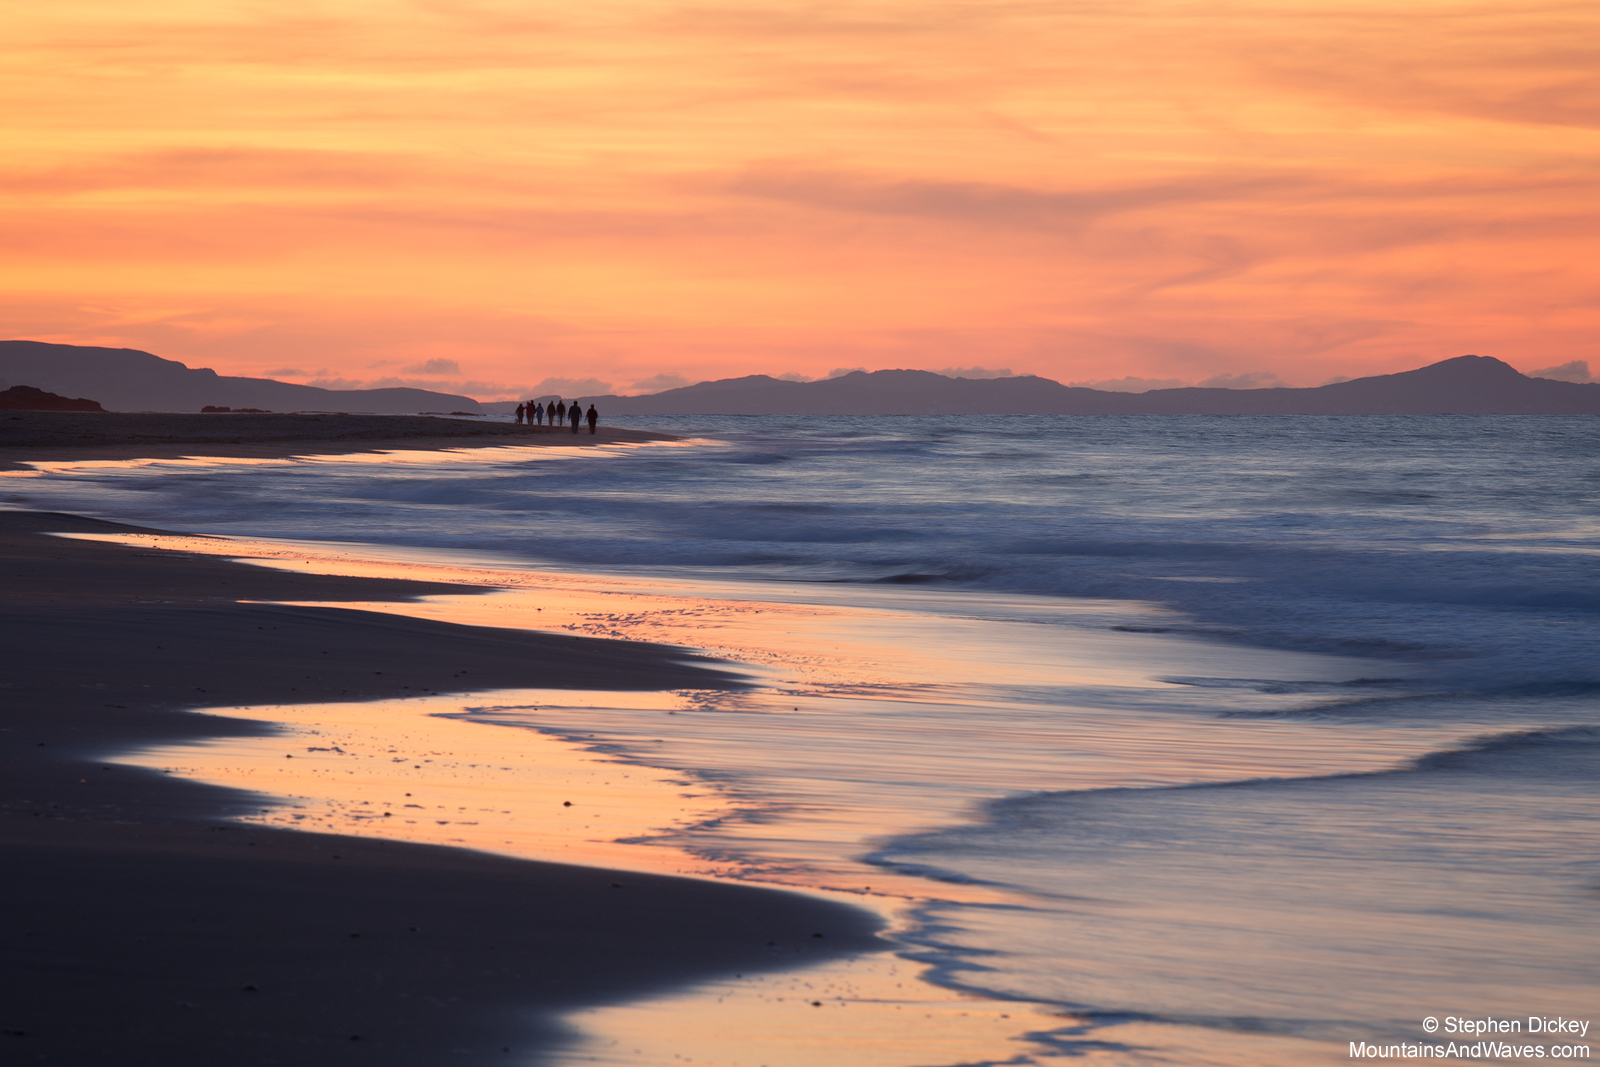 Whiterocks-Beach-Favourite-Northern-Ireland-Landscape-Photography.jpg